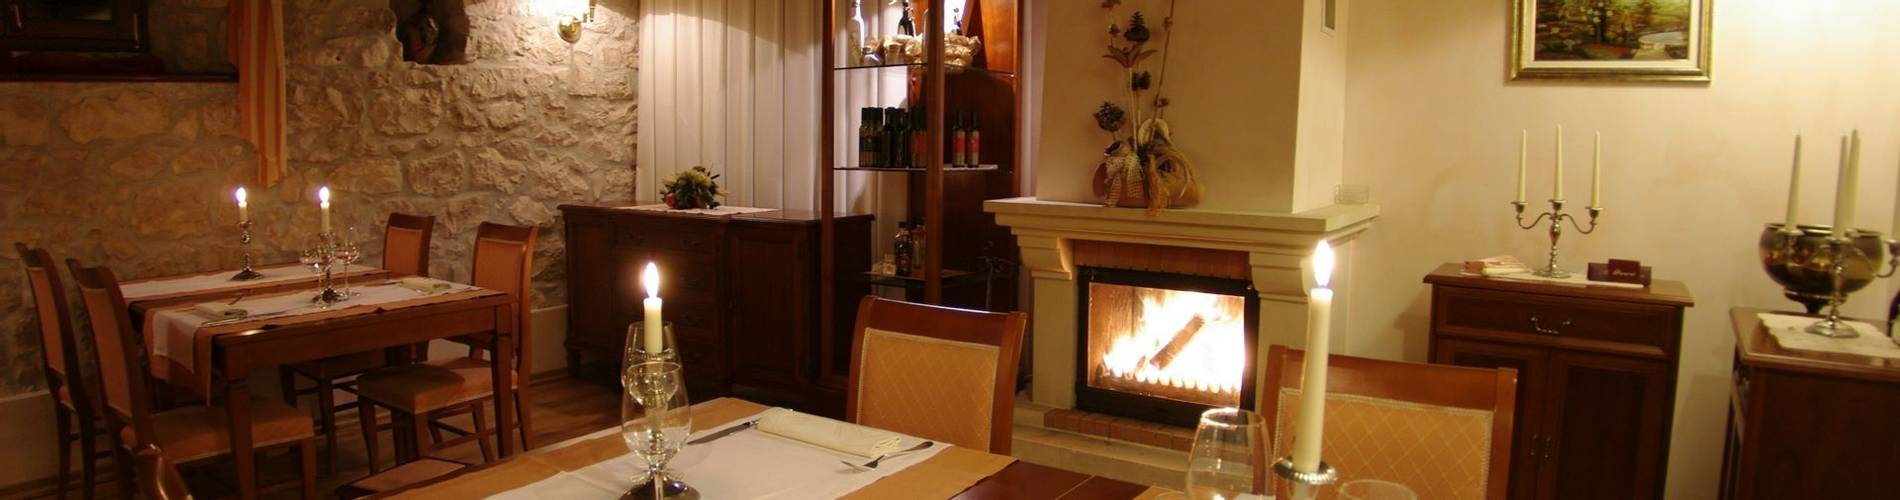 Heritage Hotel San Rocco, Istra, Croatia (28).JPG